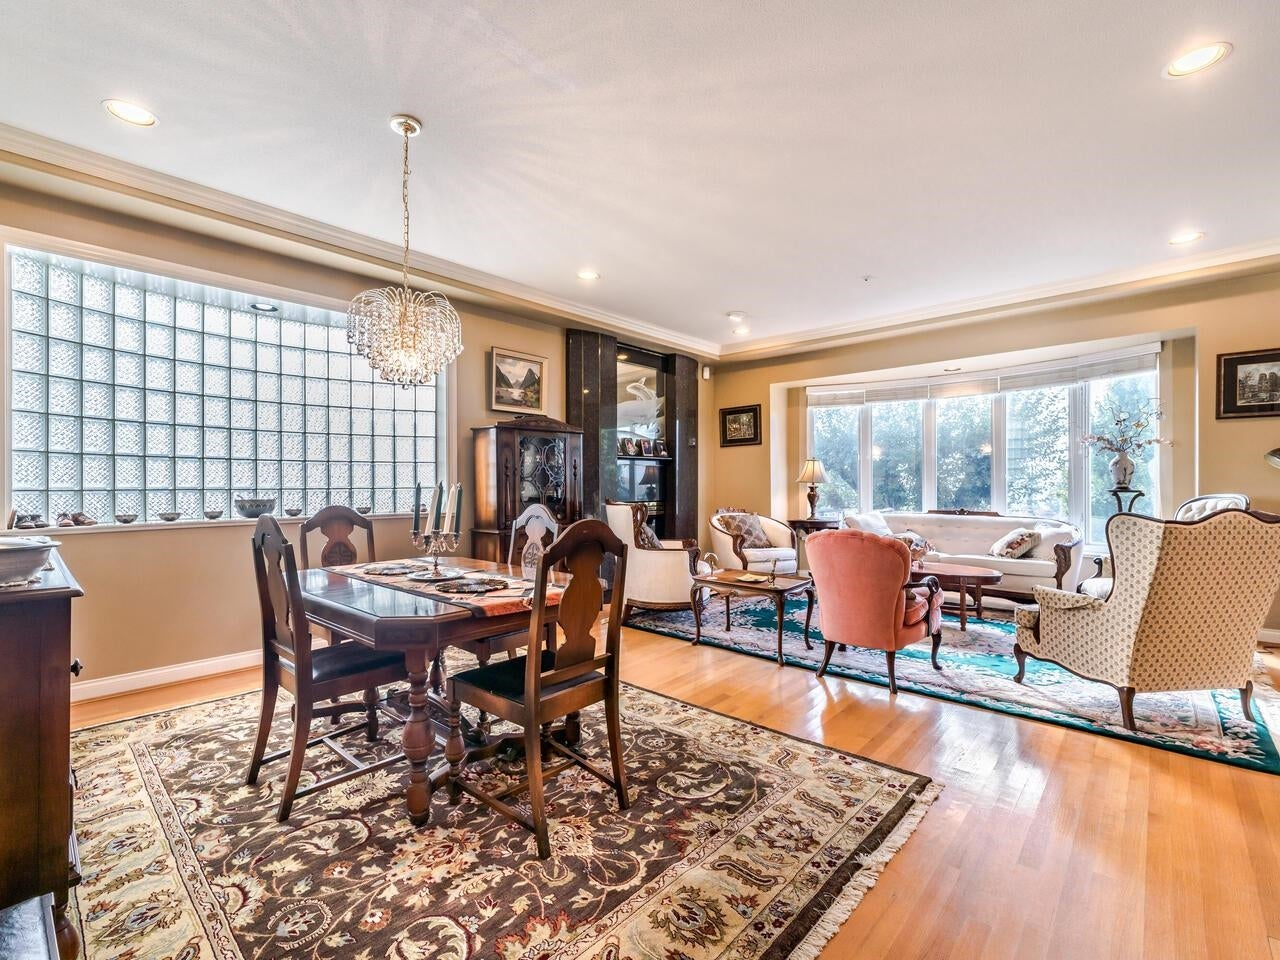 7888 JASPER CRESCENT - Fraserview VE House/Single Family for sale, 7 Bedrooms (R2622945) - #7